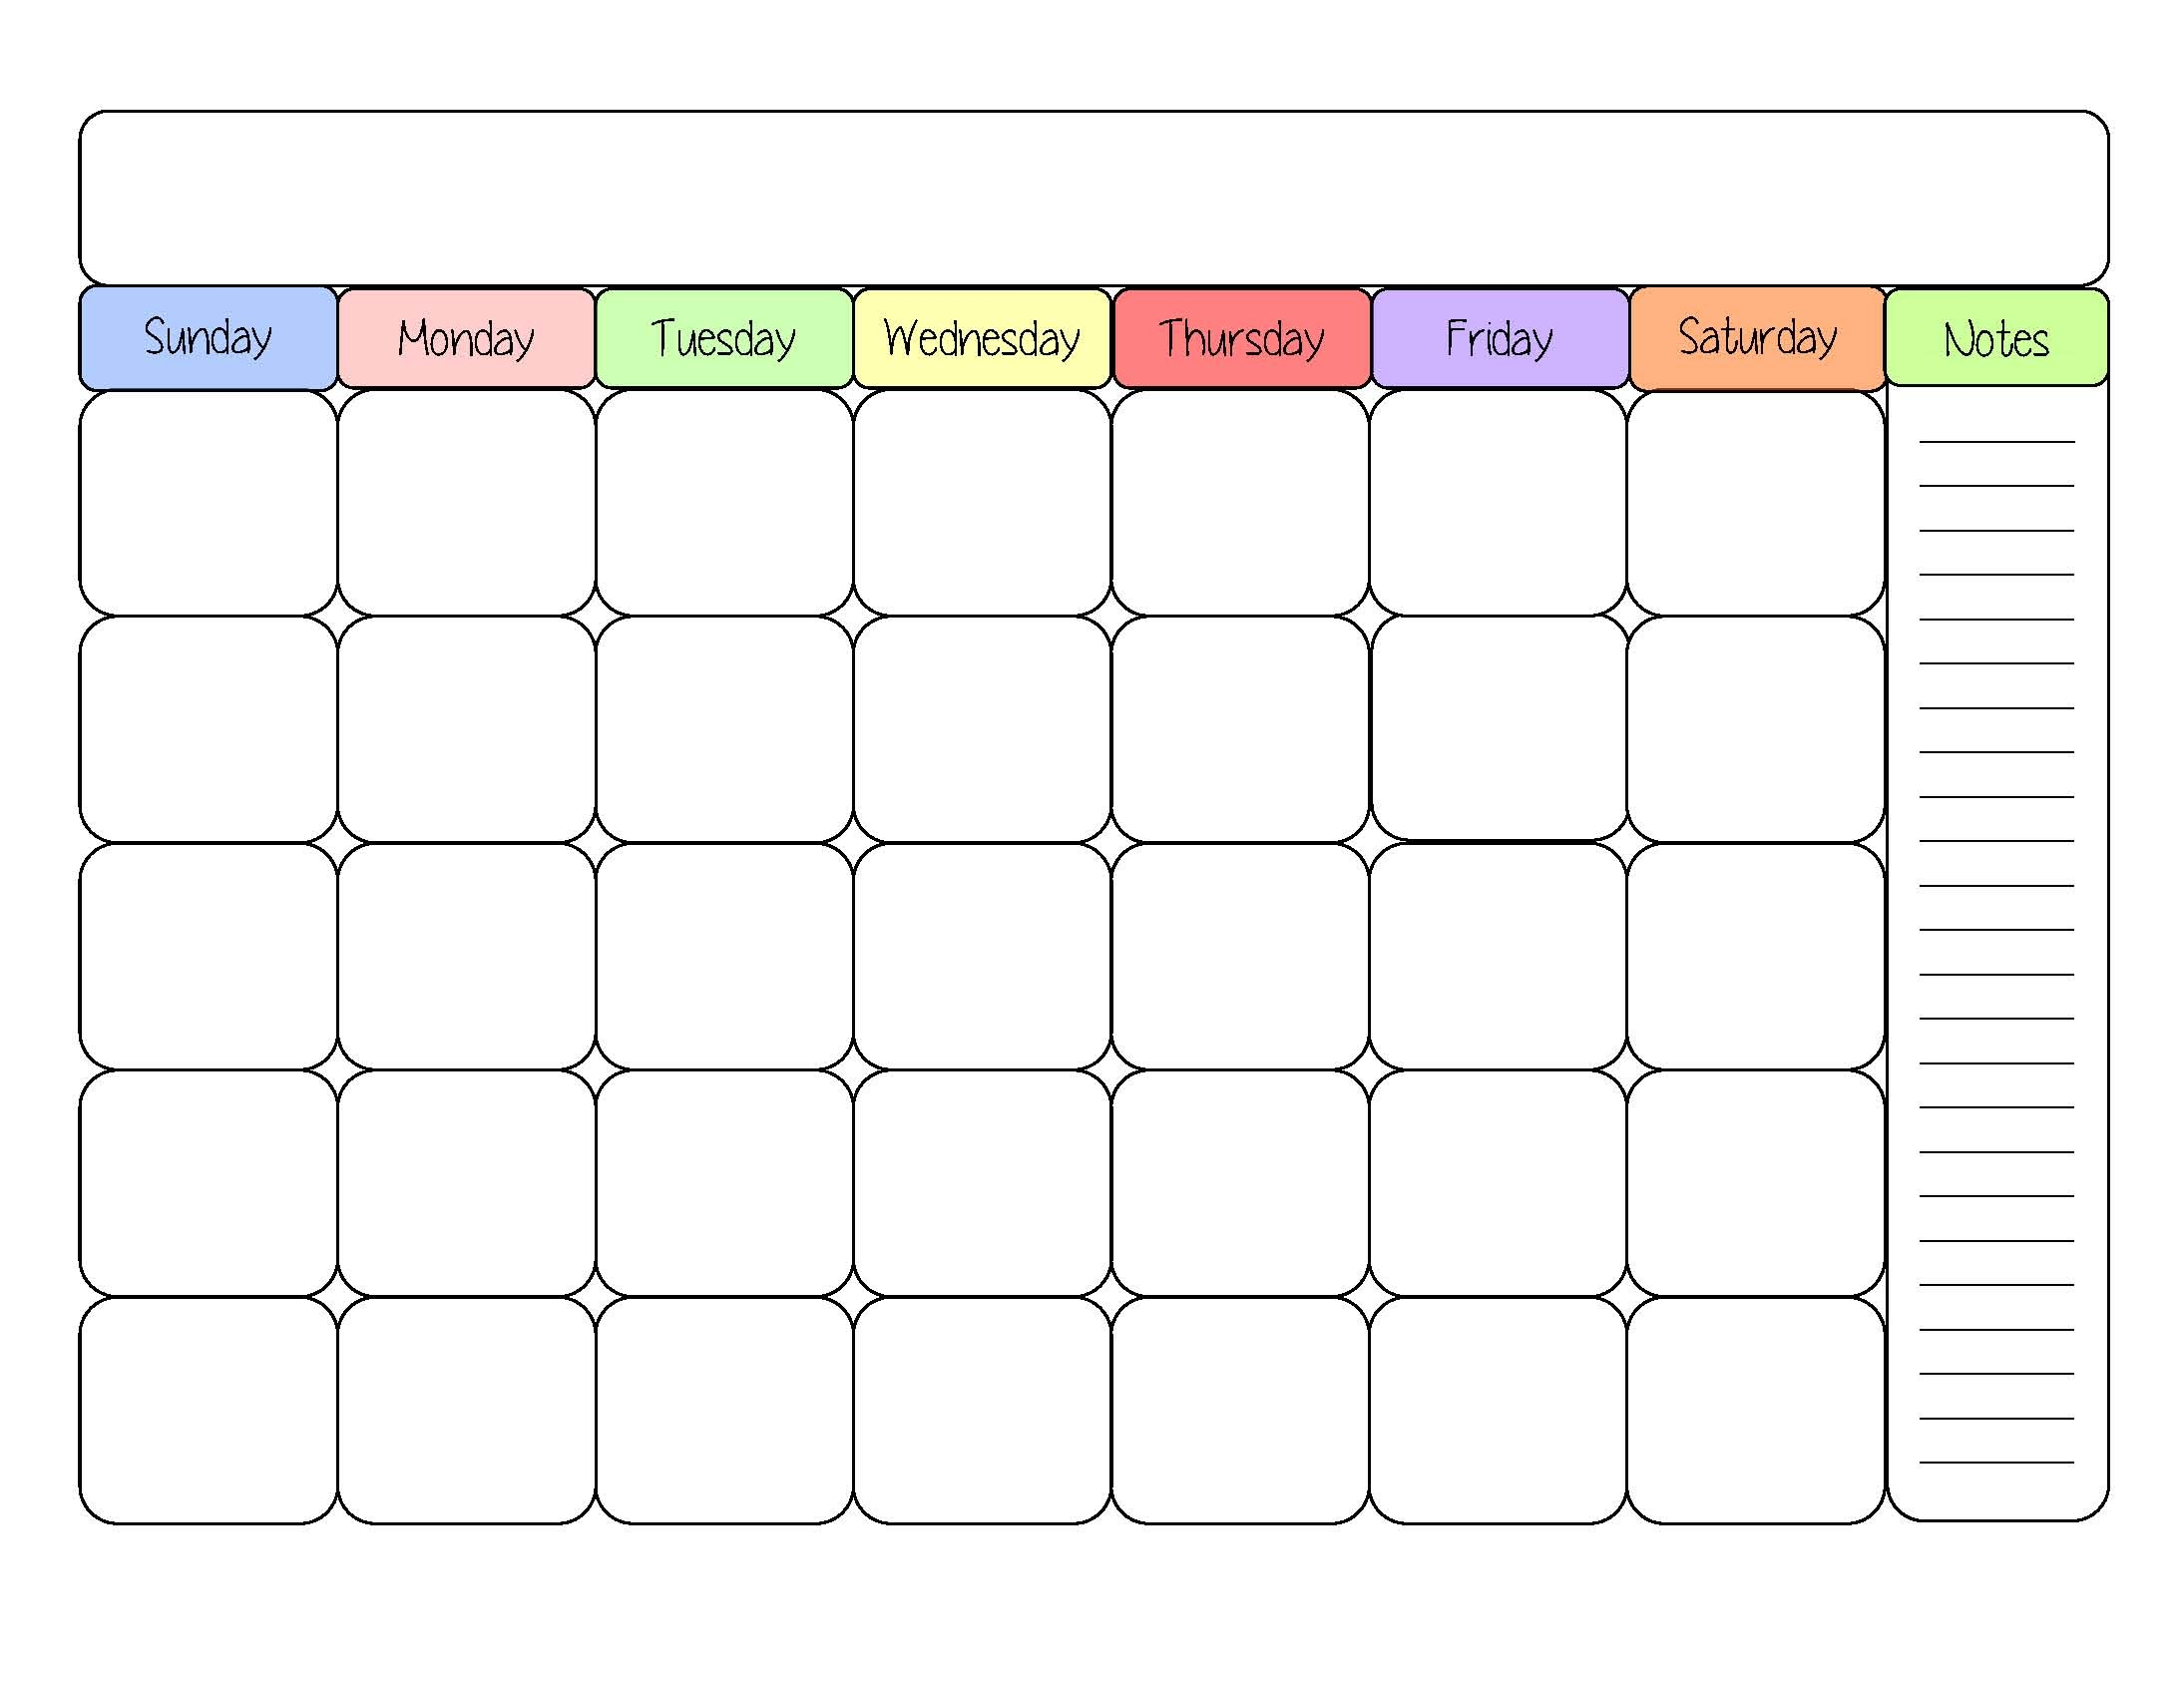 Free Fillable Calendar Templates Commonpenceco 89uj